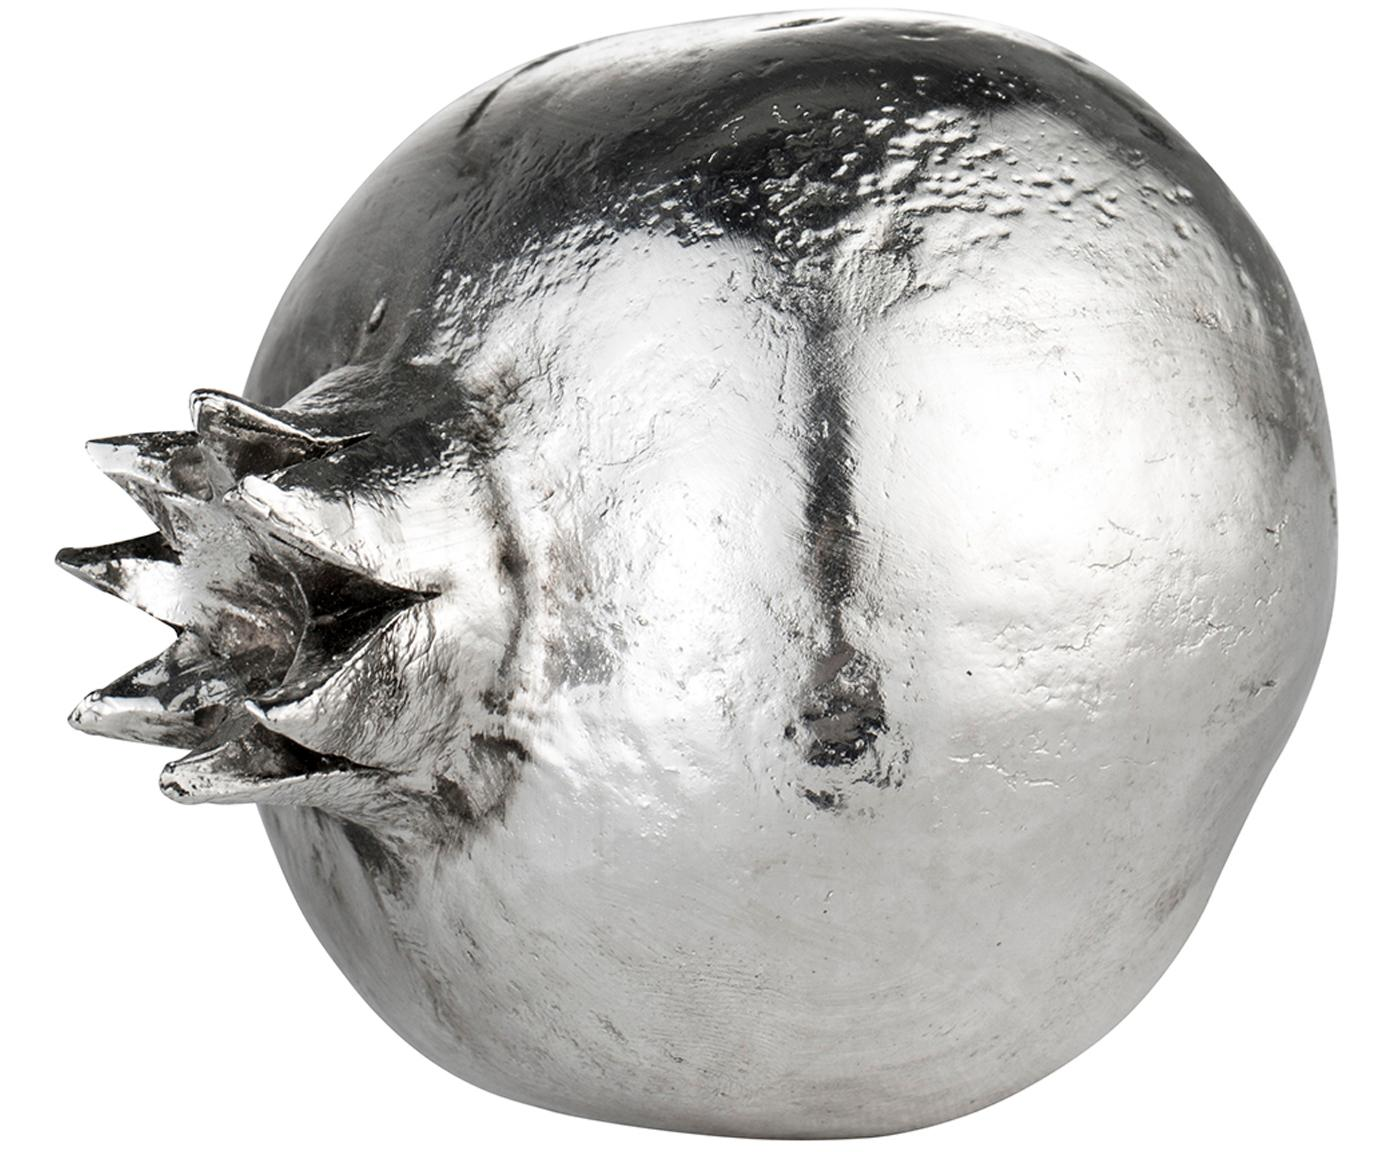 Decoratief object Serafina Pomegranate, Polyresin, Zilverkleurig, Ø 7 x H 8 cm